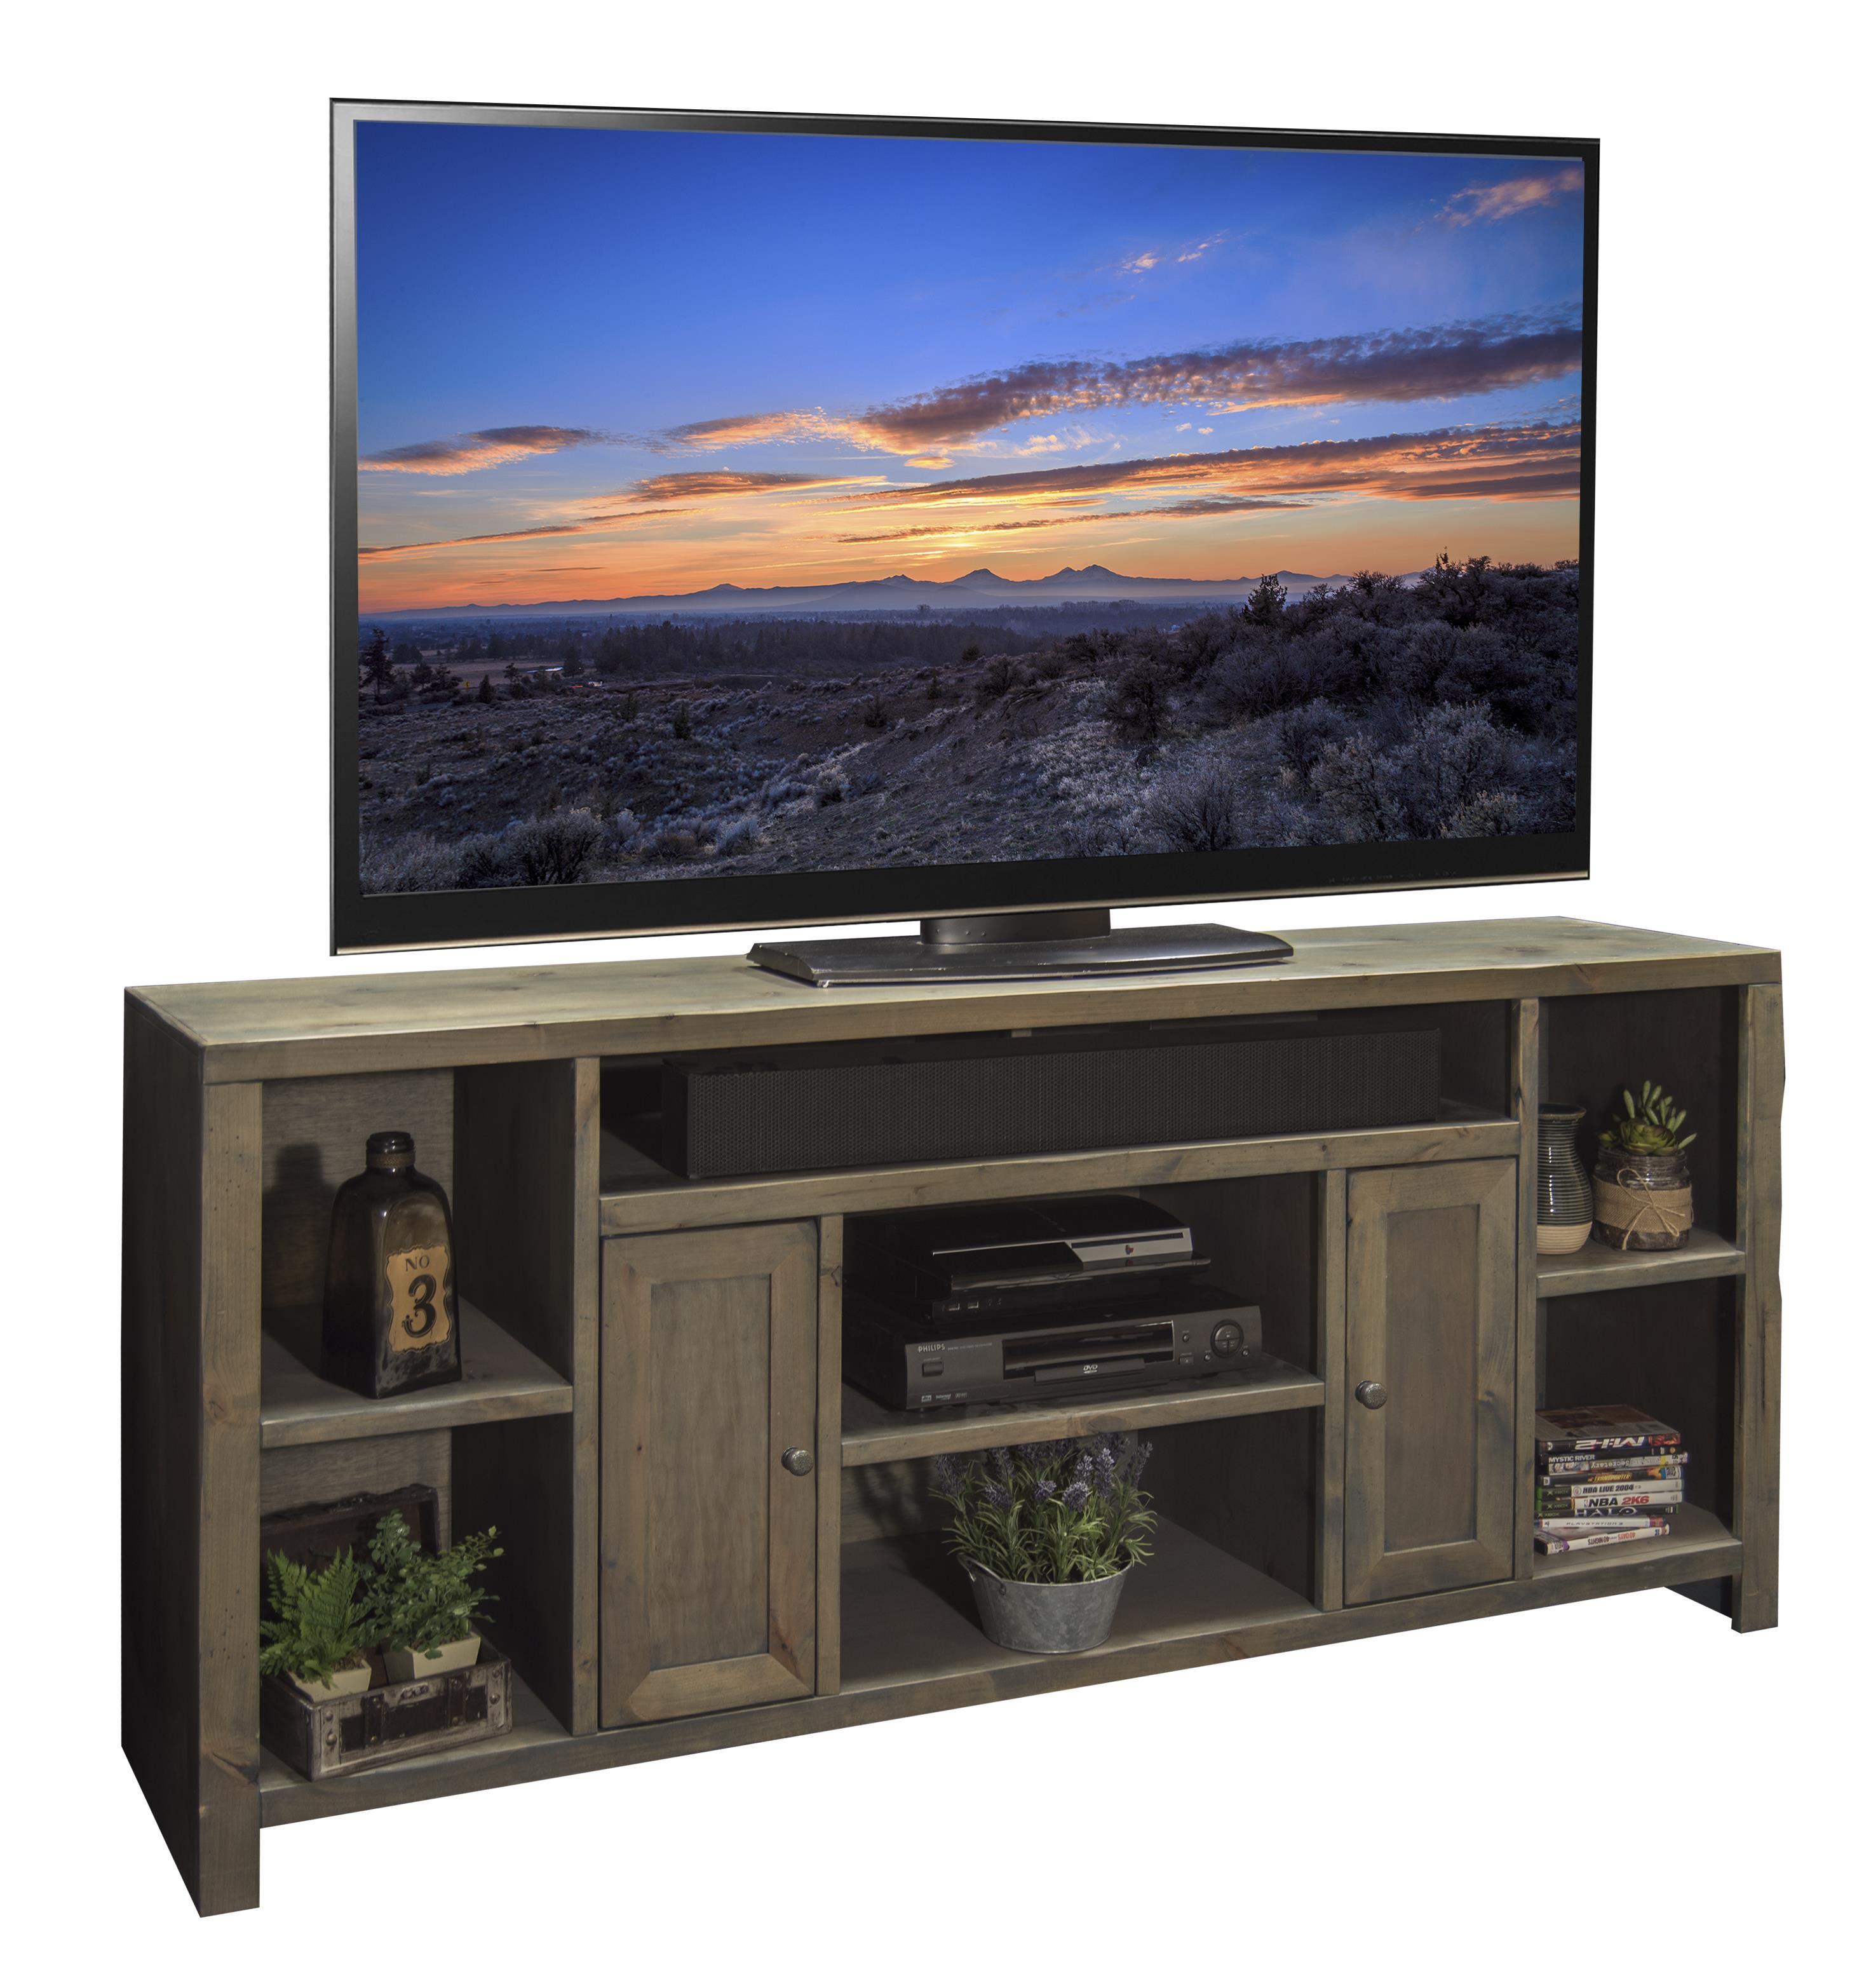 "Joshua Creek 74"" TV Console by Legends Furniture at Smart Buy Furniture"